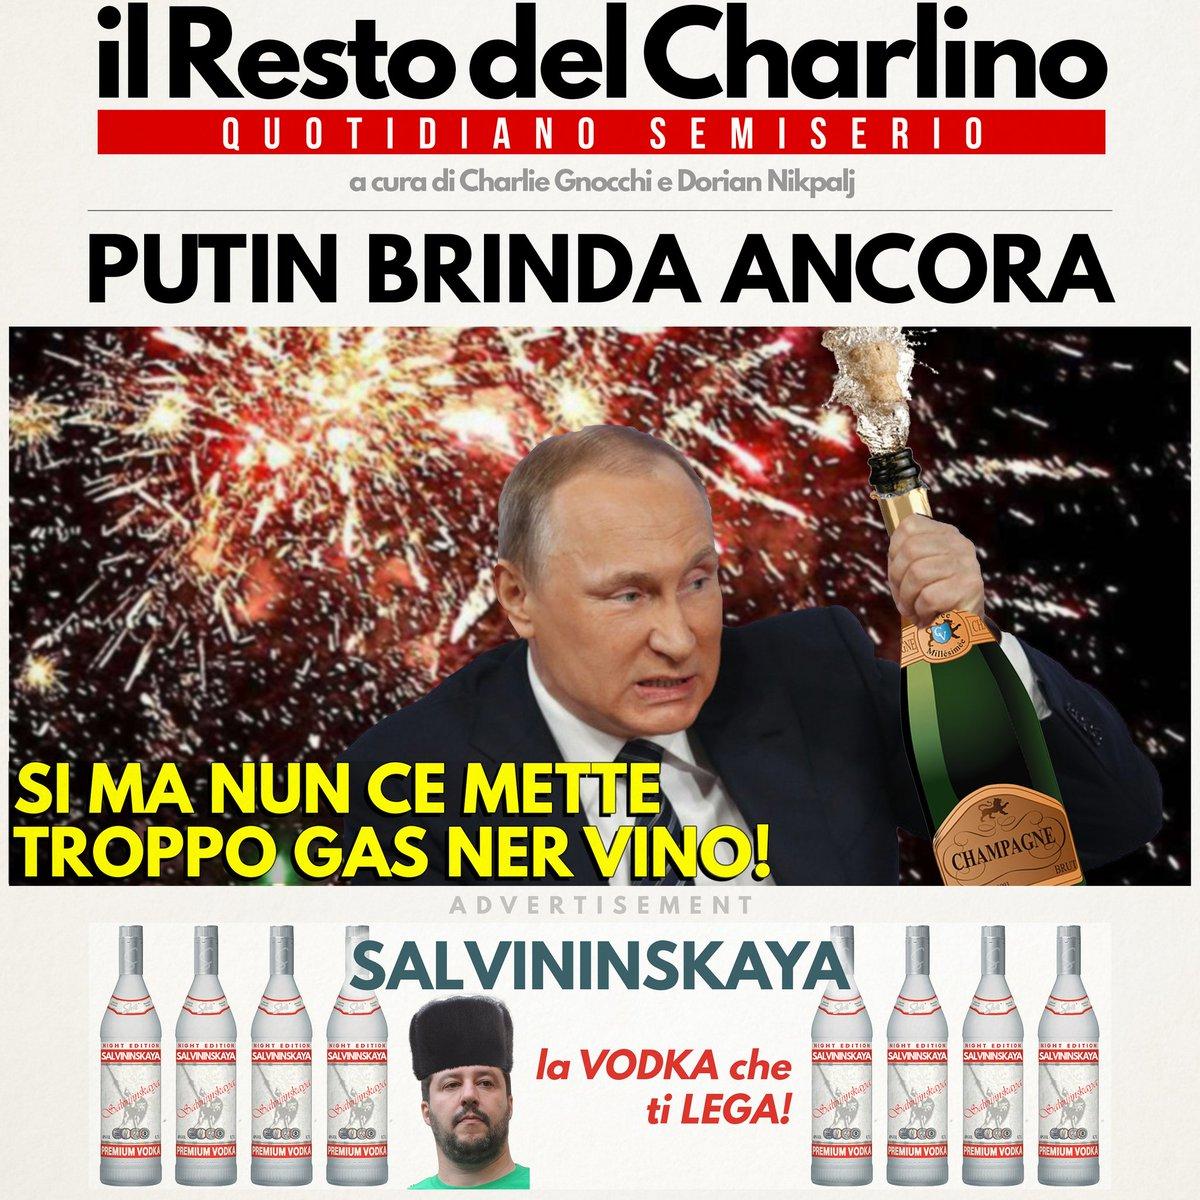 #Putin festeggia ancora! #primapagina di #lunedi #19marzo ! #FakeNews #FakeNewsMedia #satira #ElezioniRussia #elezioni2018 #Politica #Russia #mosca #festadelpapa  - Ukustom